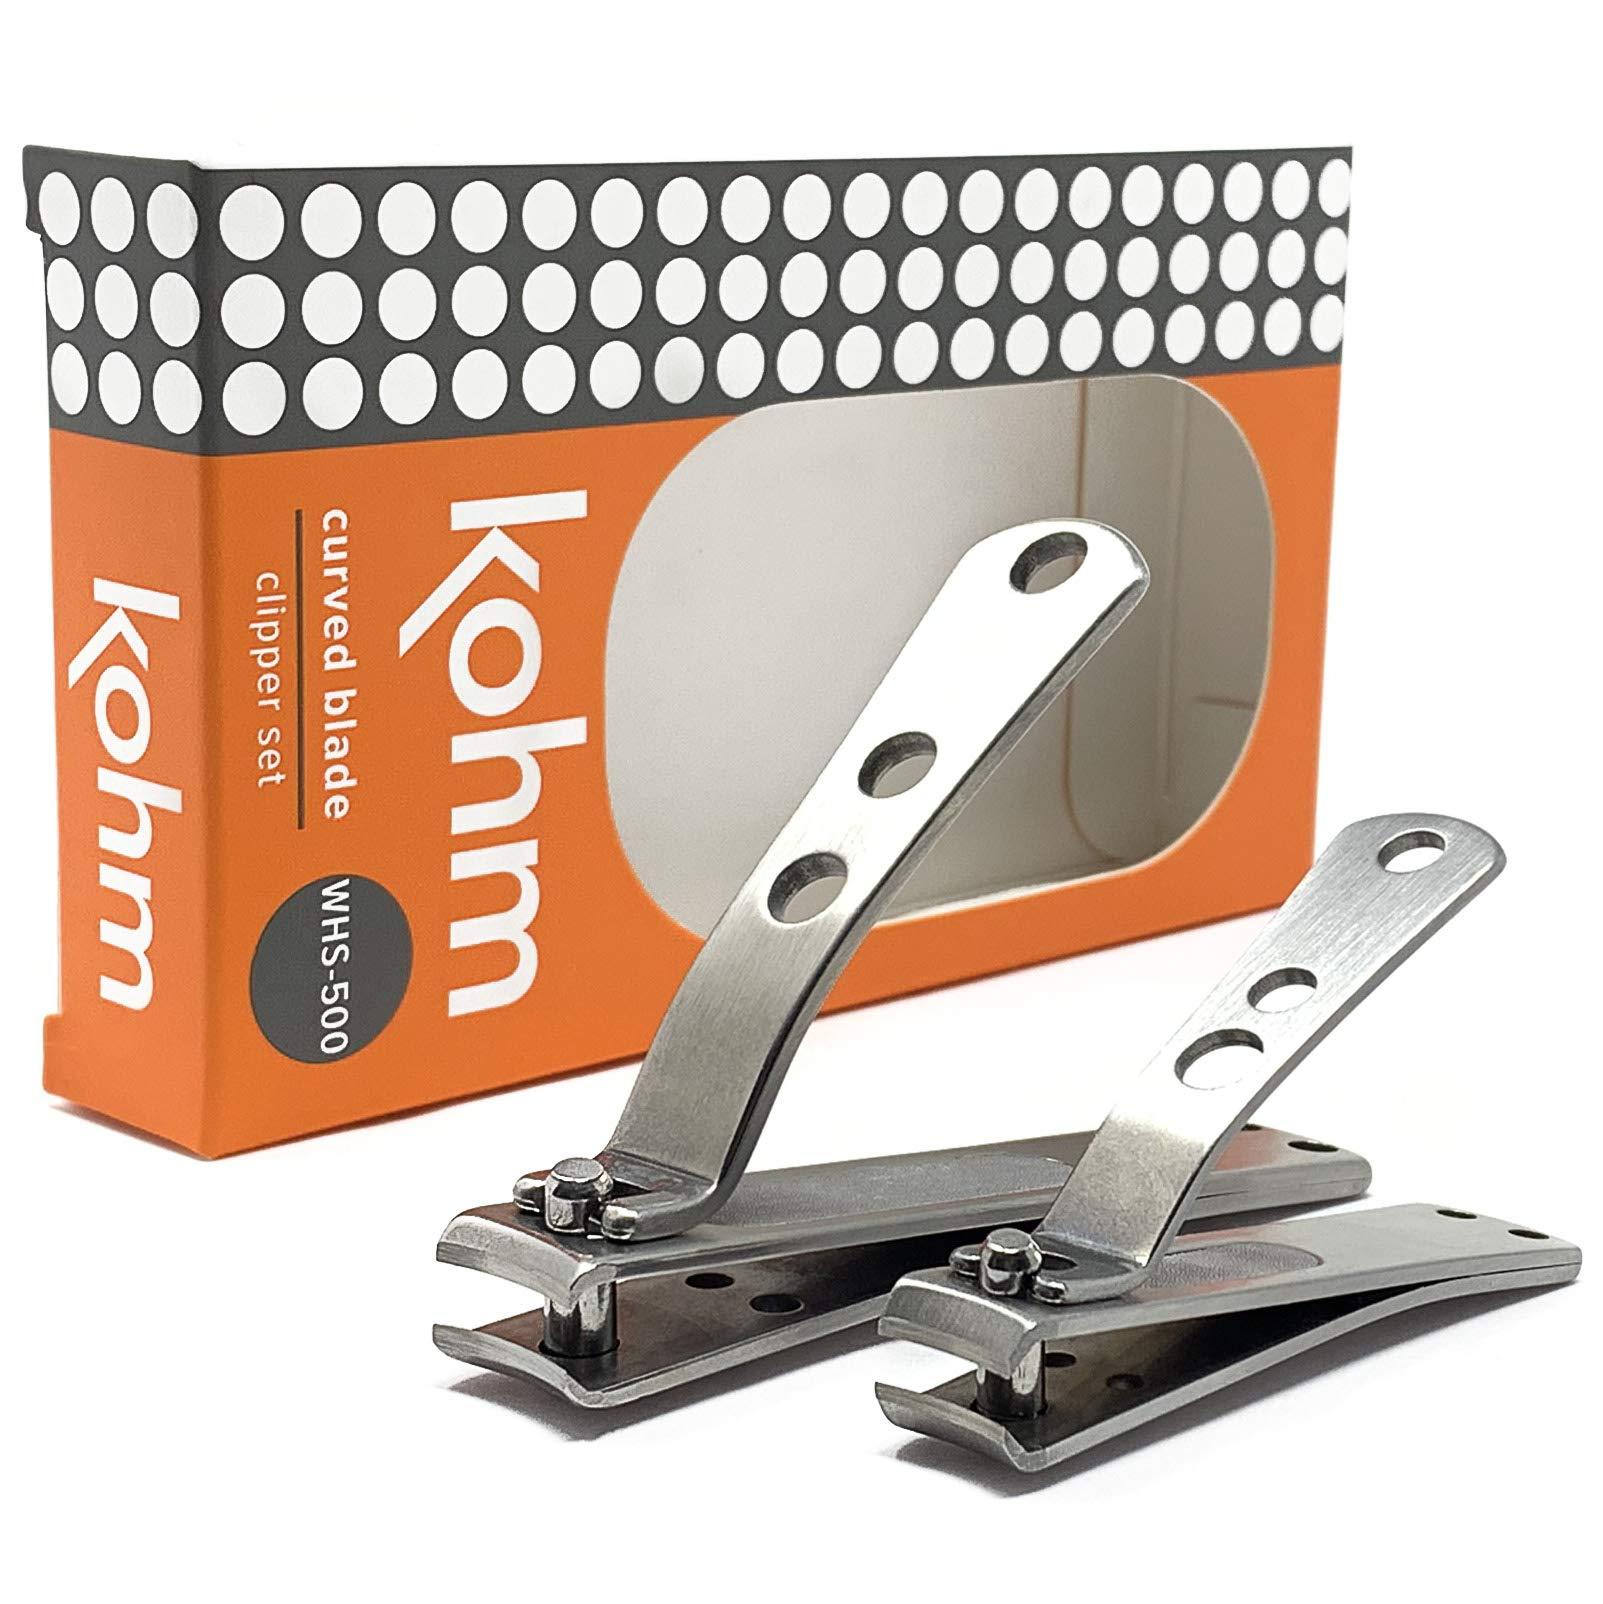 Kohm Nail Clipper Set for Thick Nails by Kohm